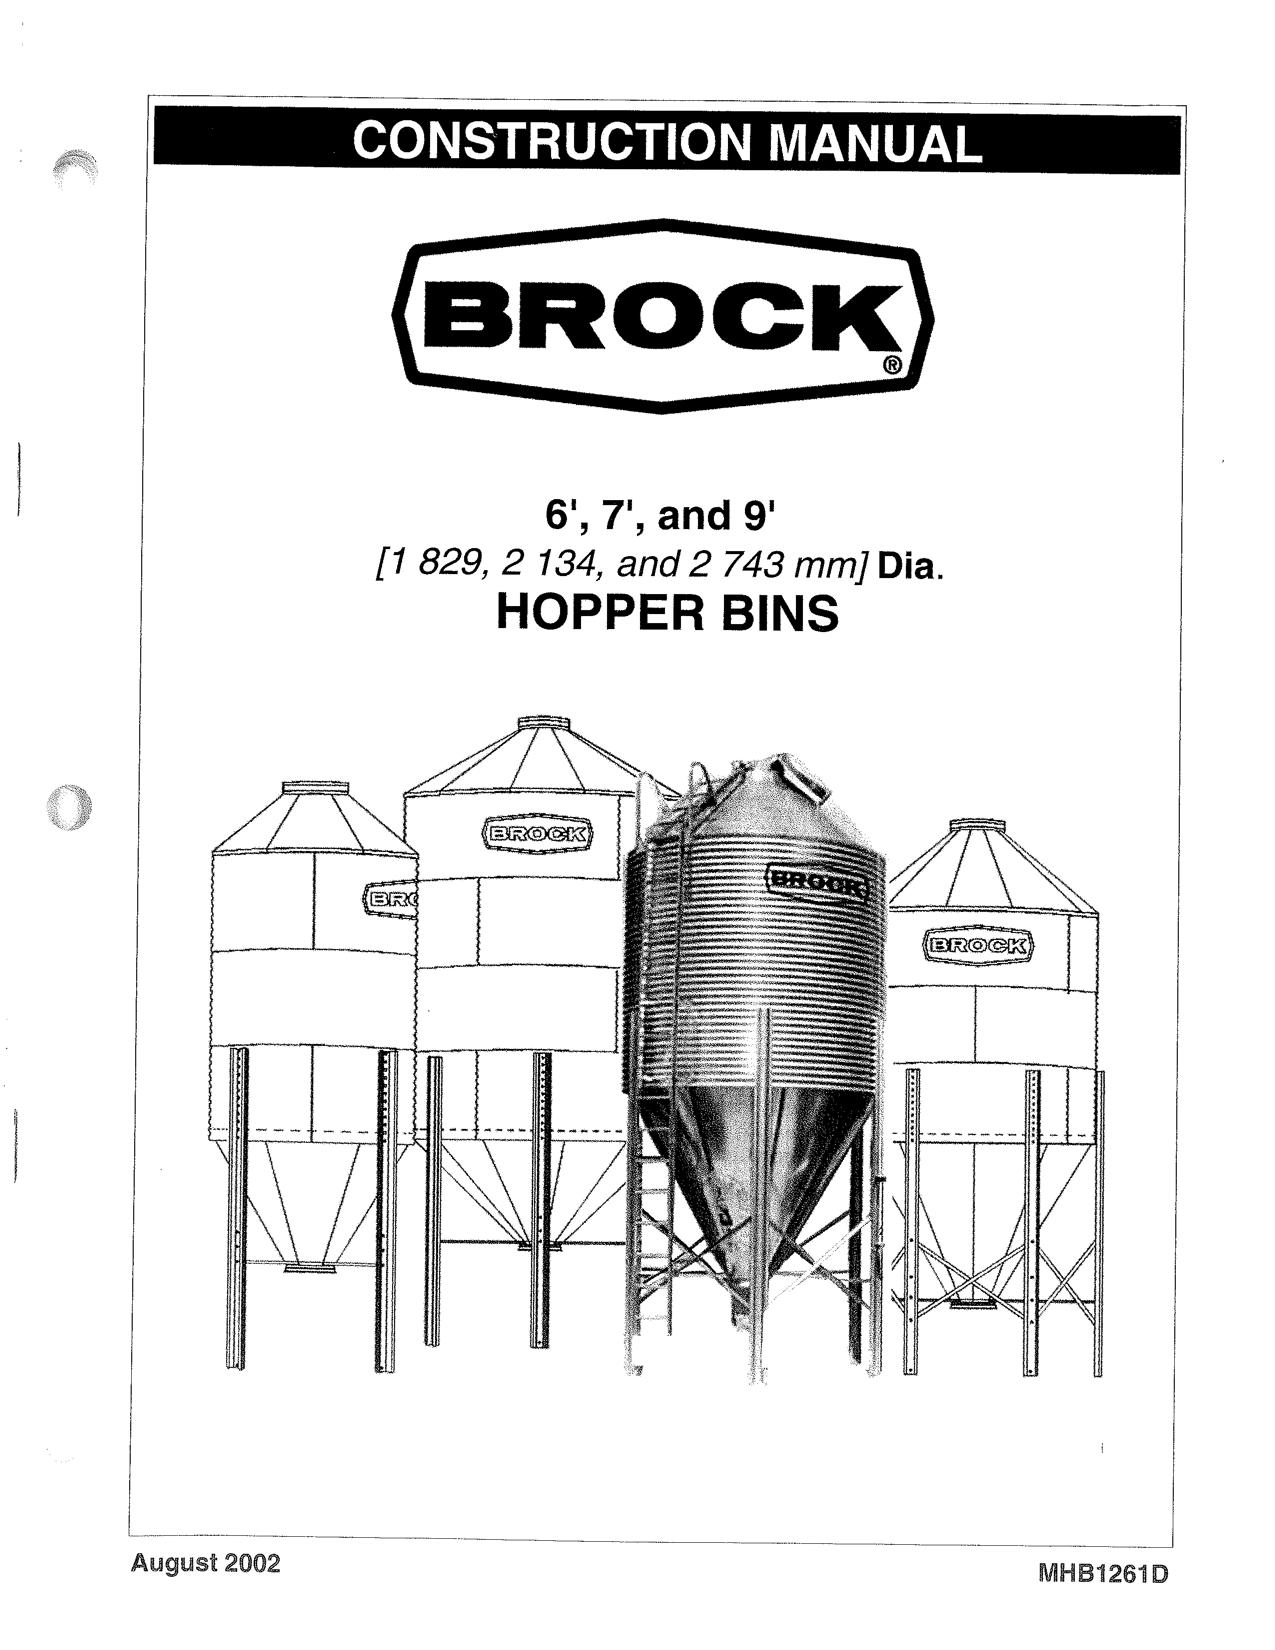 brockfoundation copy.png